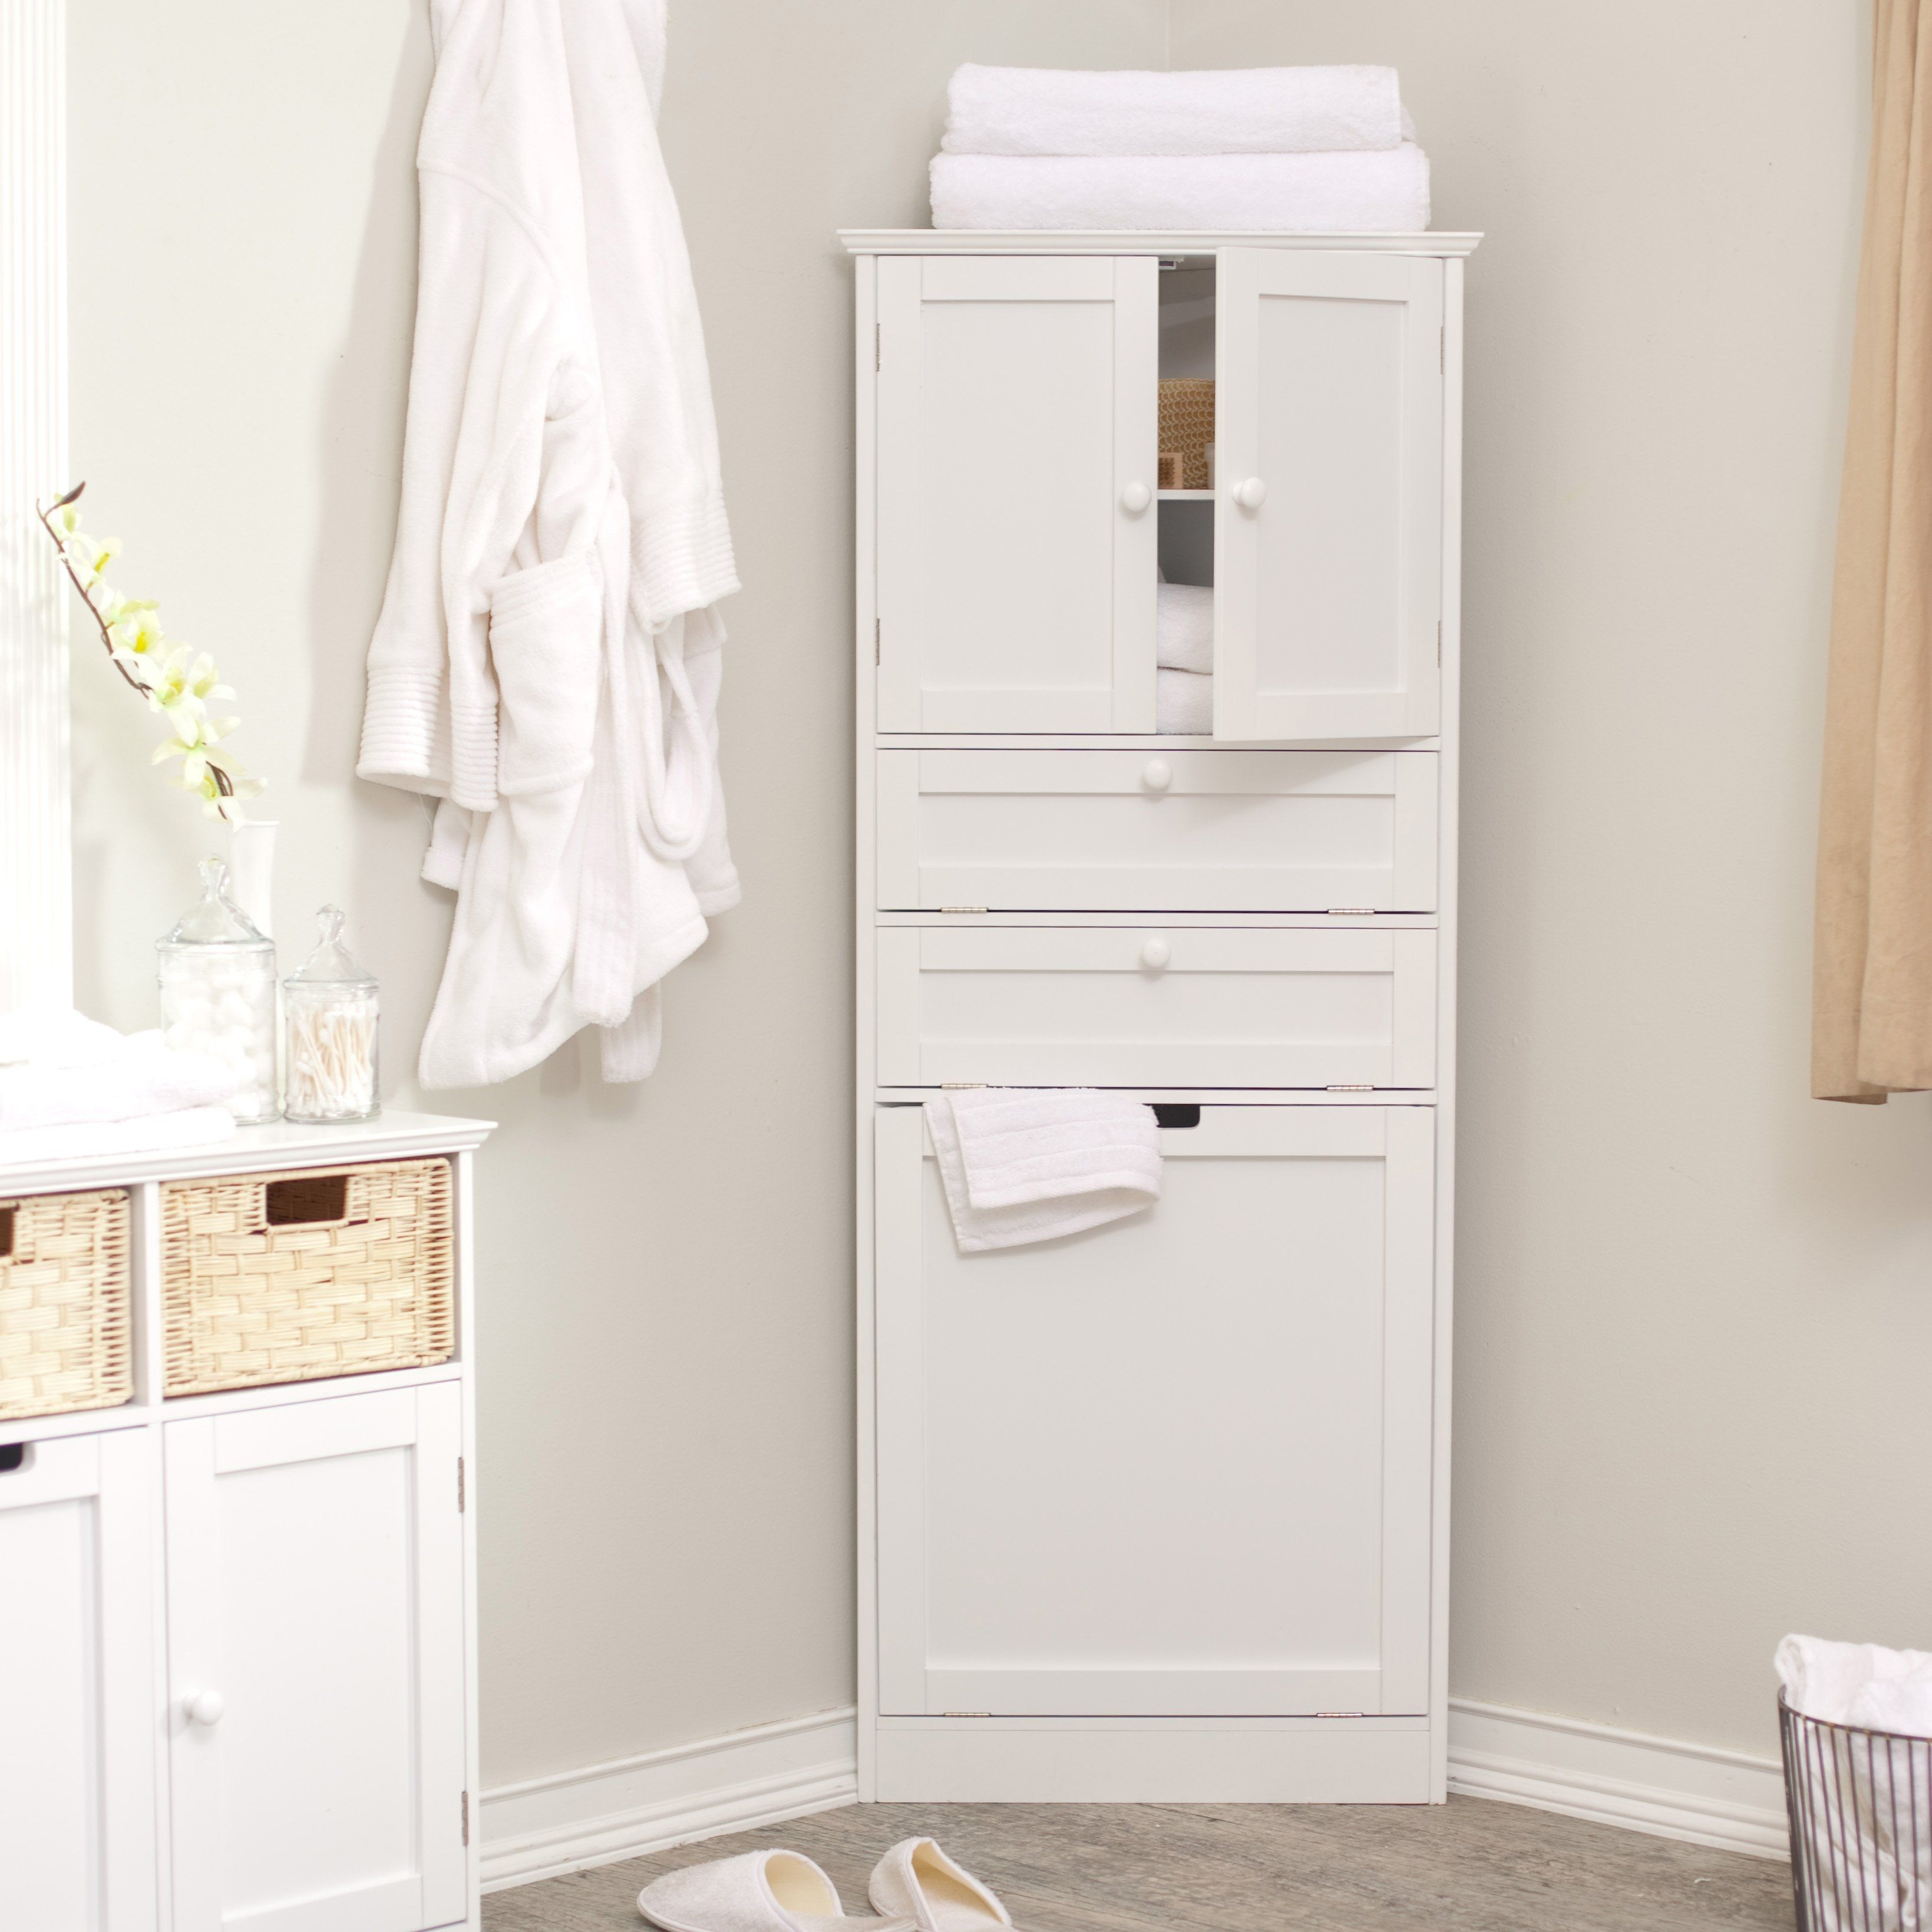 Small Corner Bathroom Storage Cabinet  Httpdivulgamaisweb Mesmerizing Small Corner Cabinet Bathroom Inspiration Design